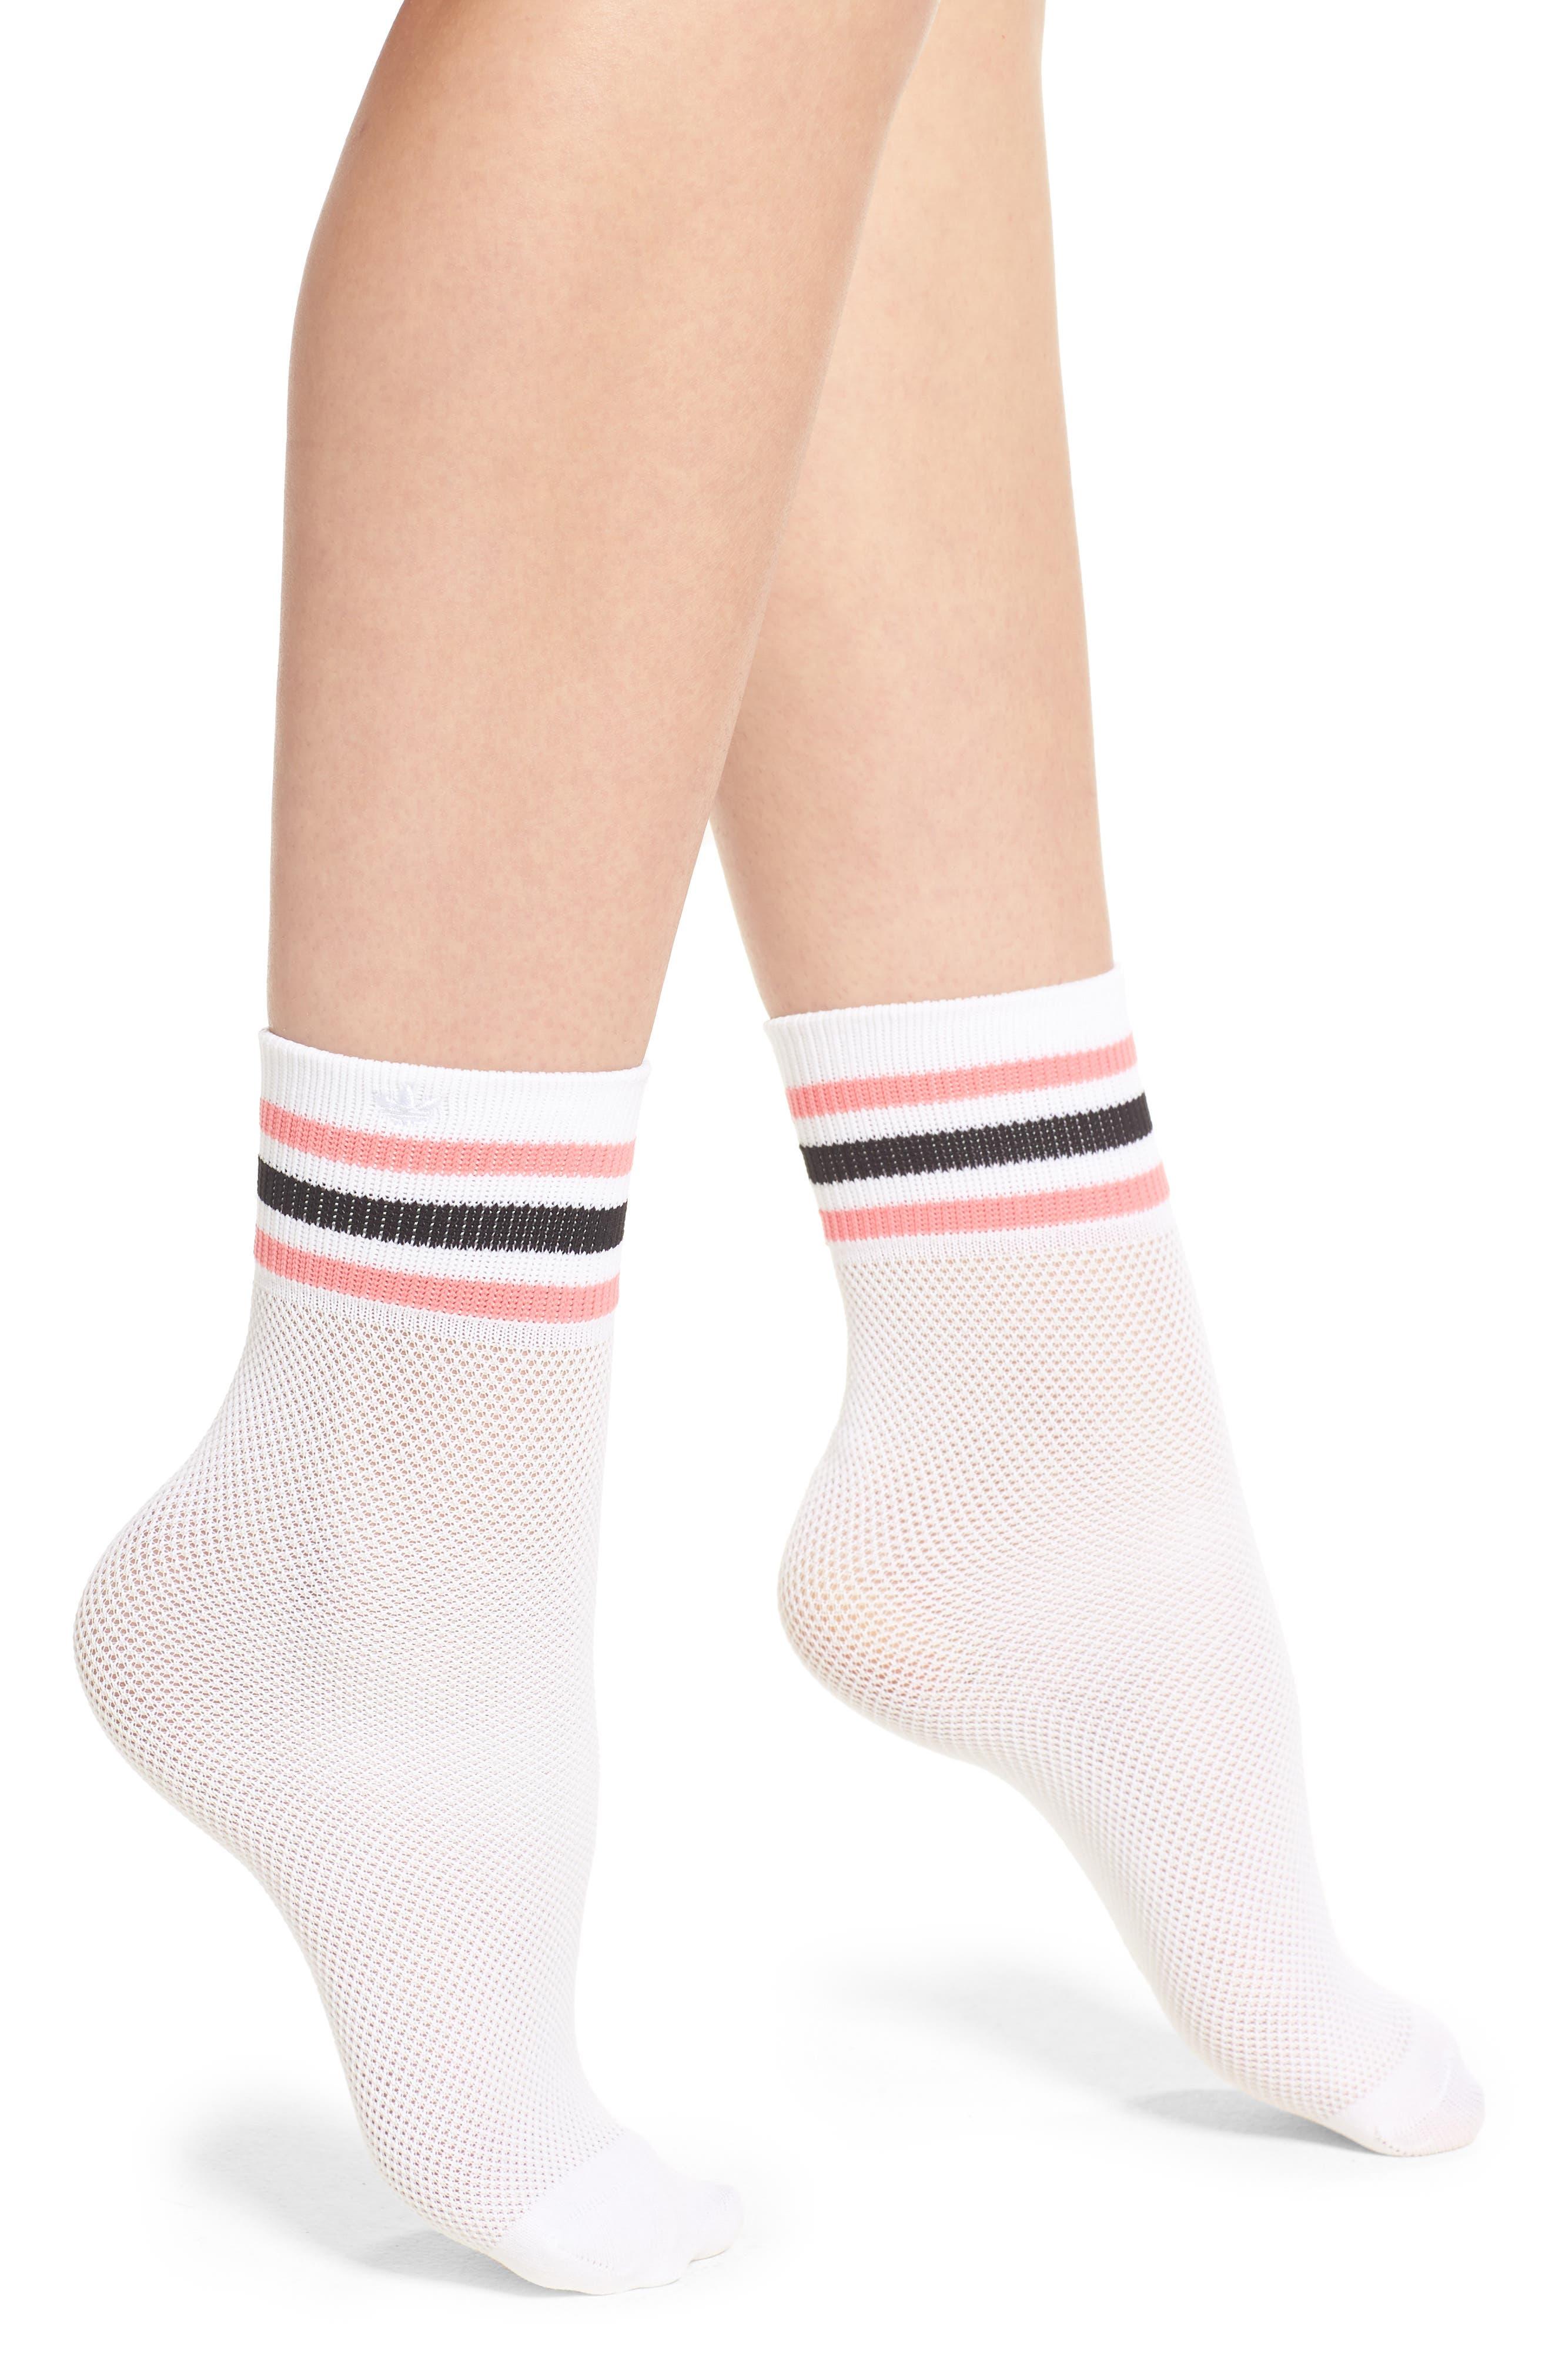 Stripe Mesh Ankle Socks,                             Main thumbnail 1, color,                             White/ Chalk Pink/ Black